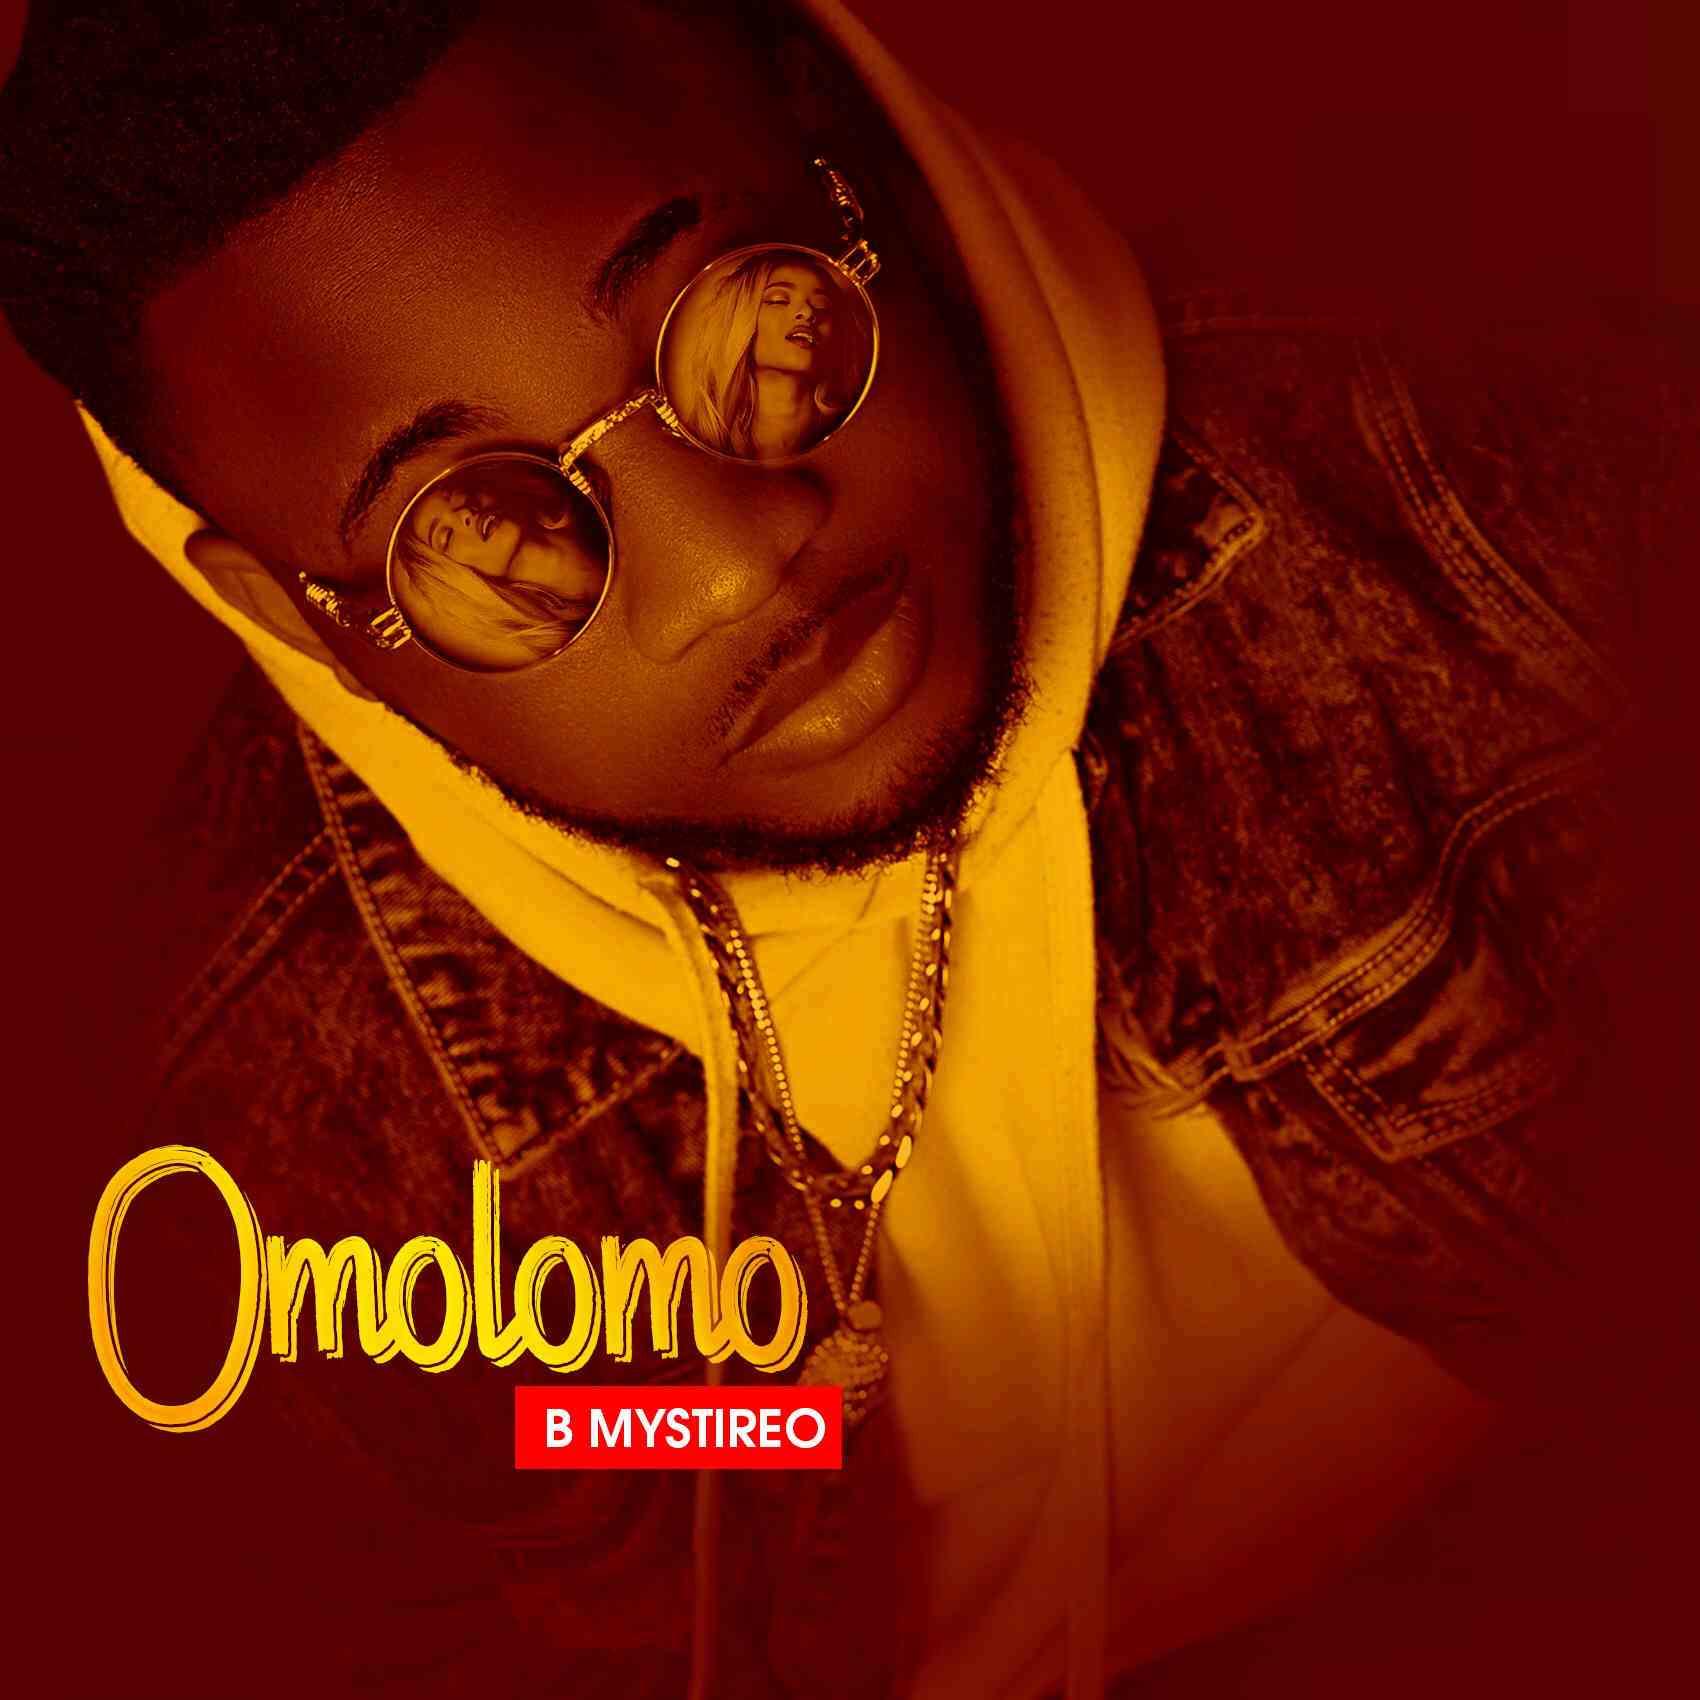 New Music: Bmystireo - Omolomo